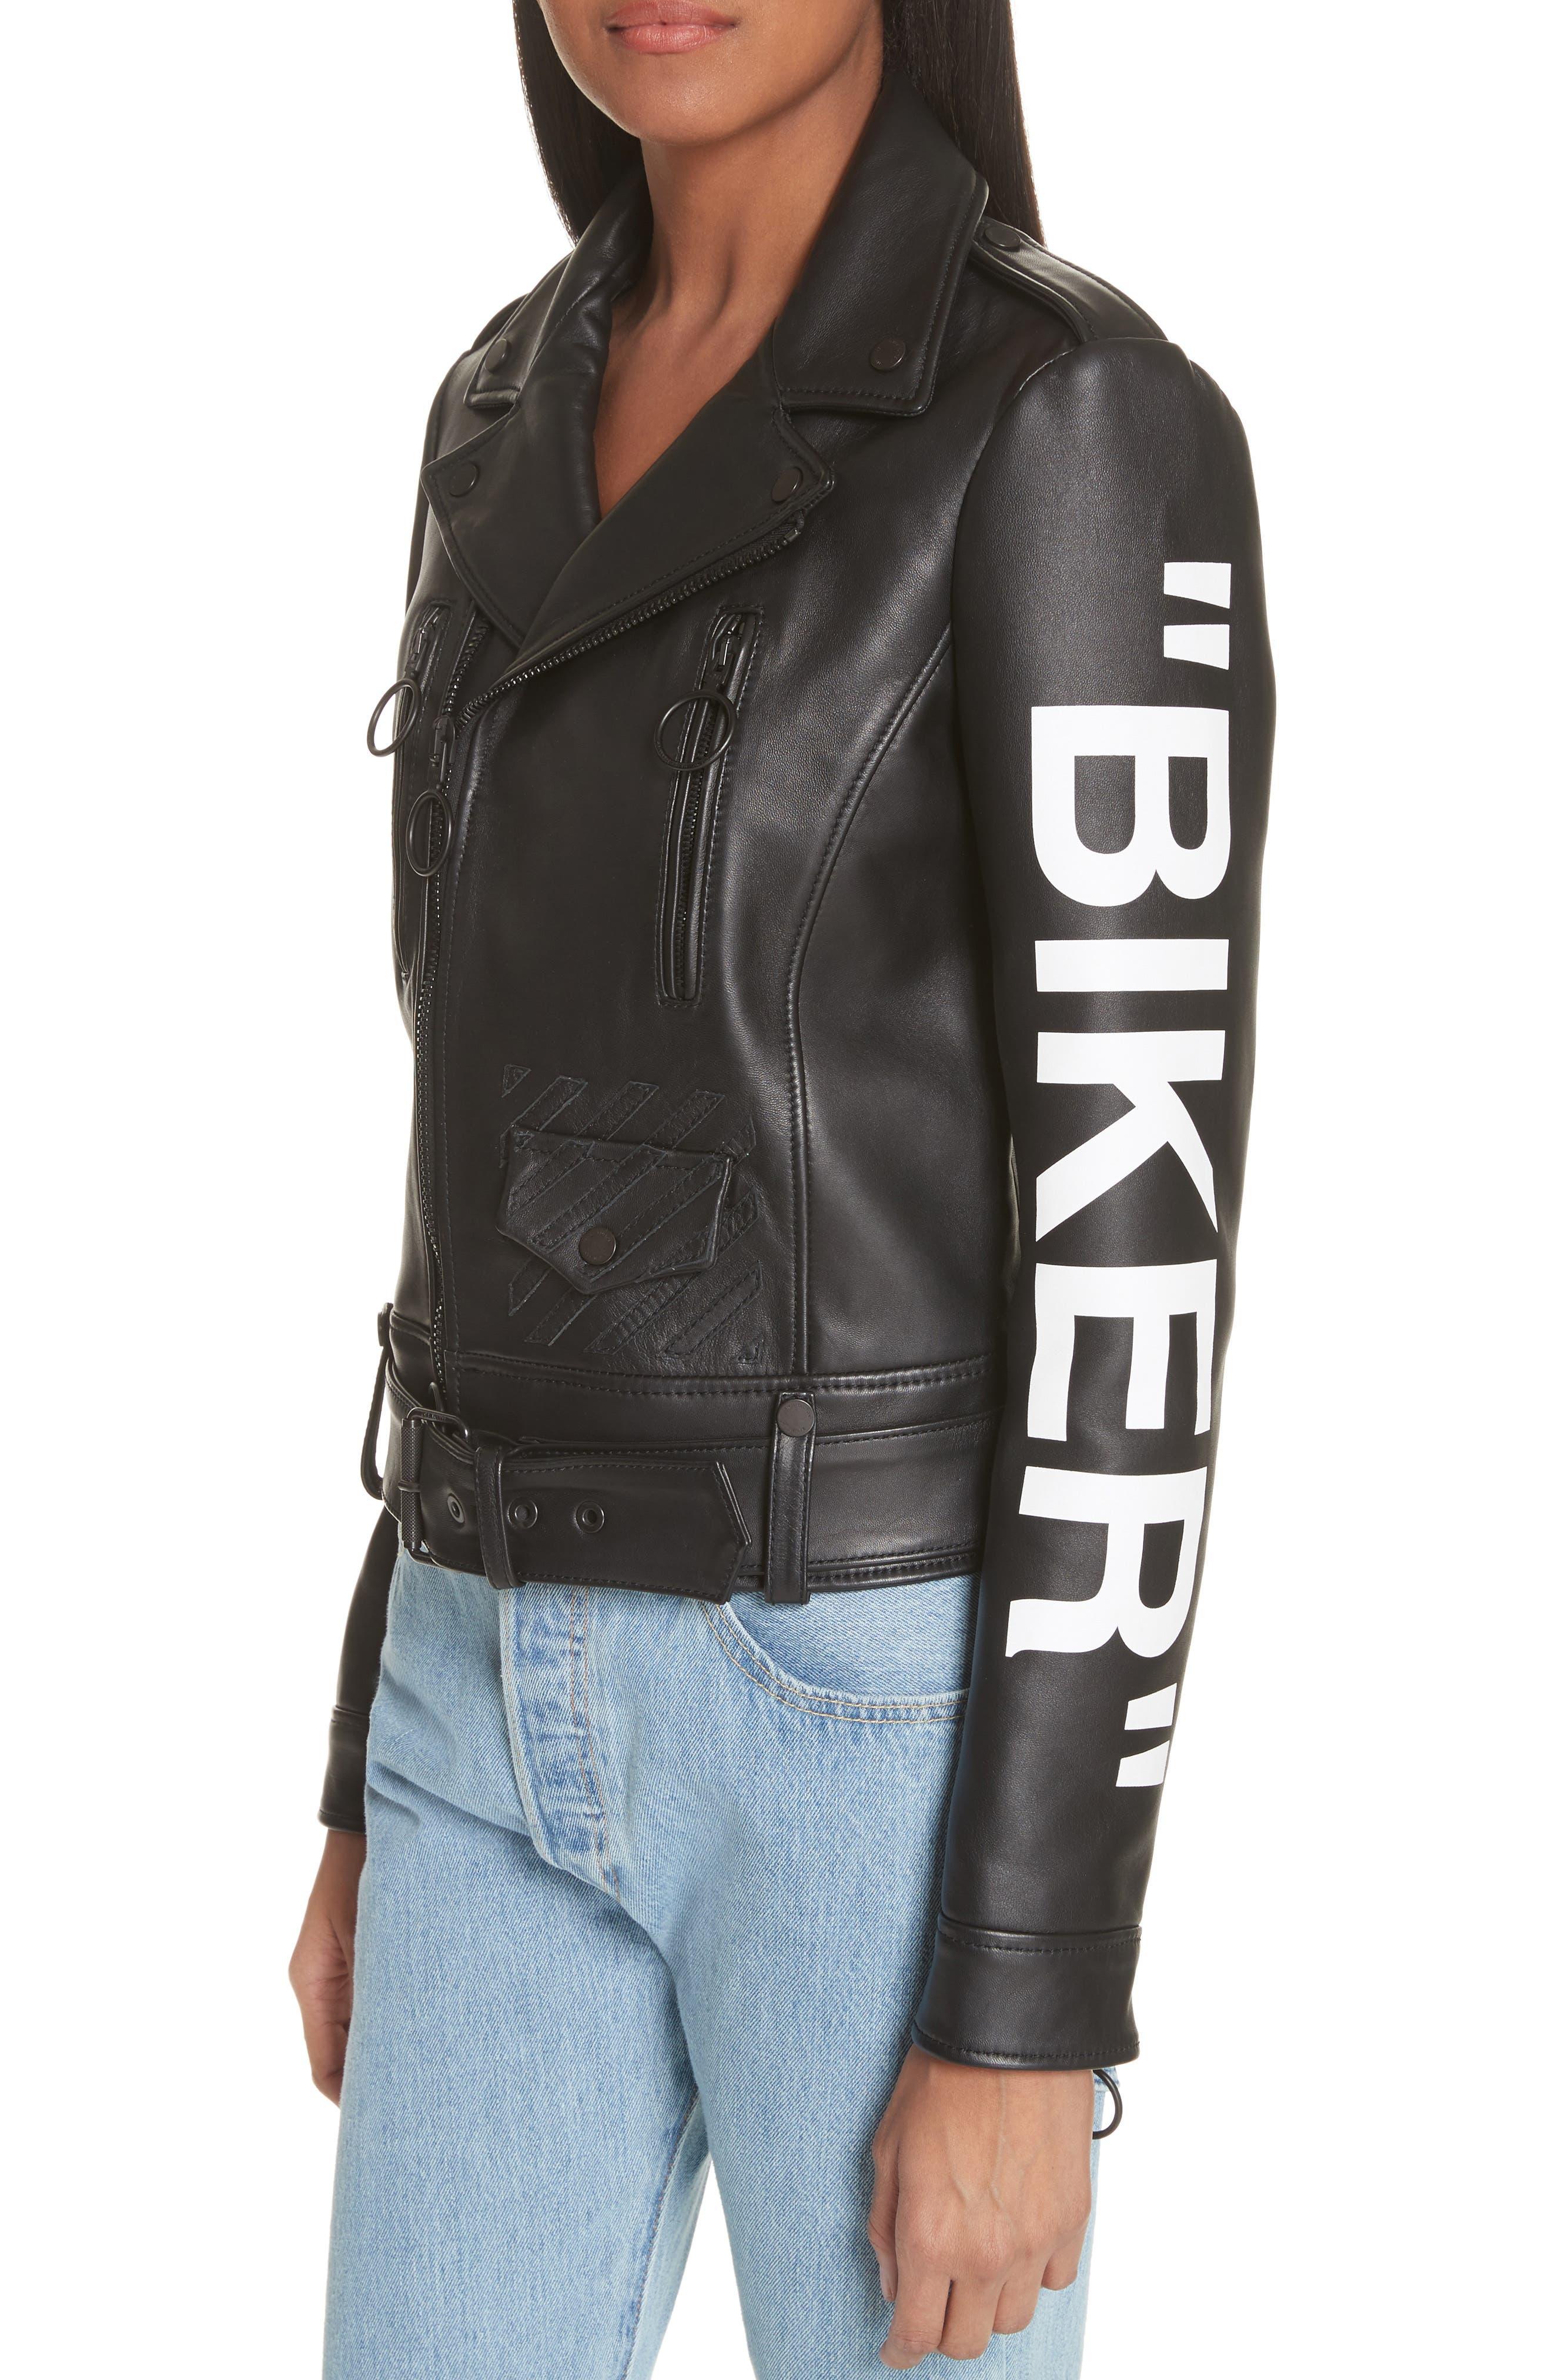 Leather Biker Jacket,                             Alternate thumbnail 4, color,                             Black/ White